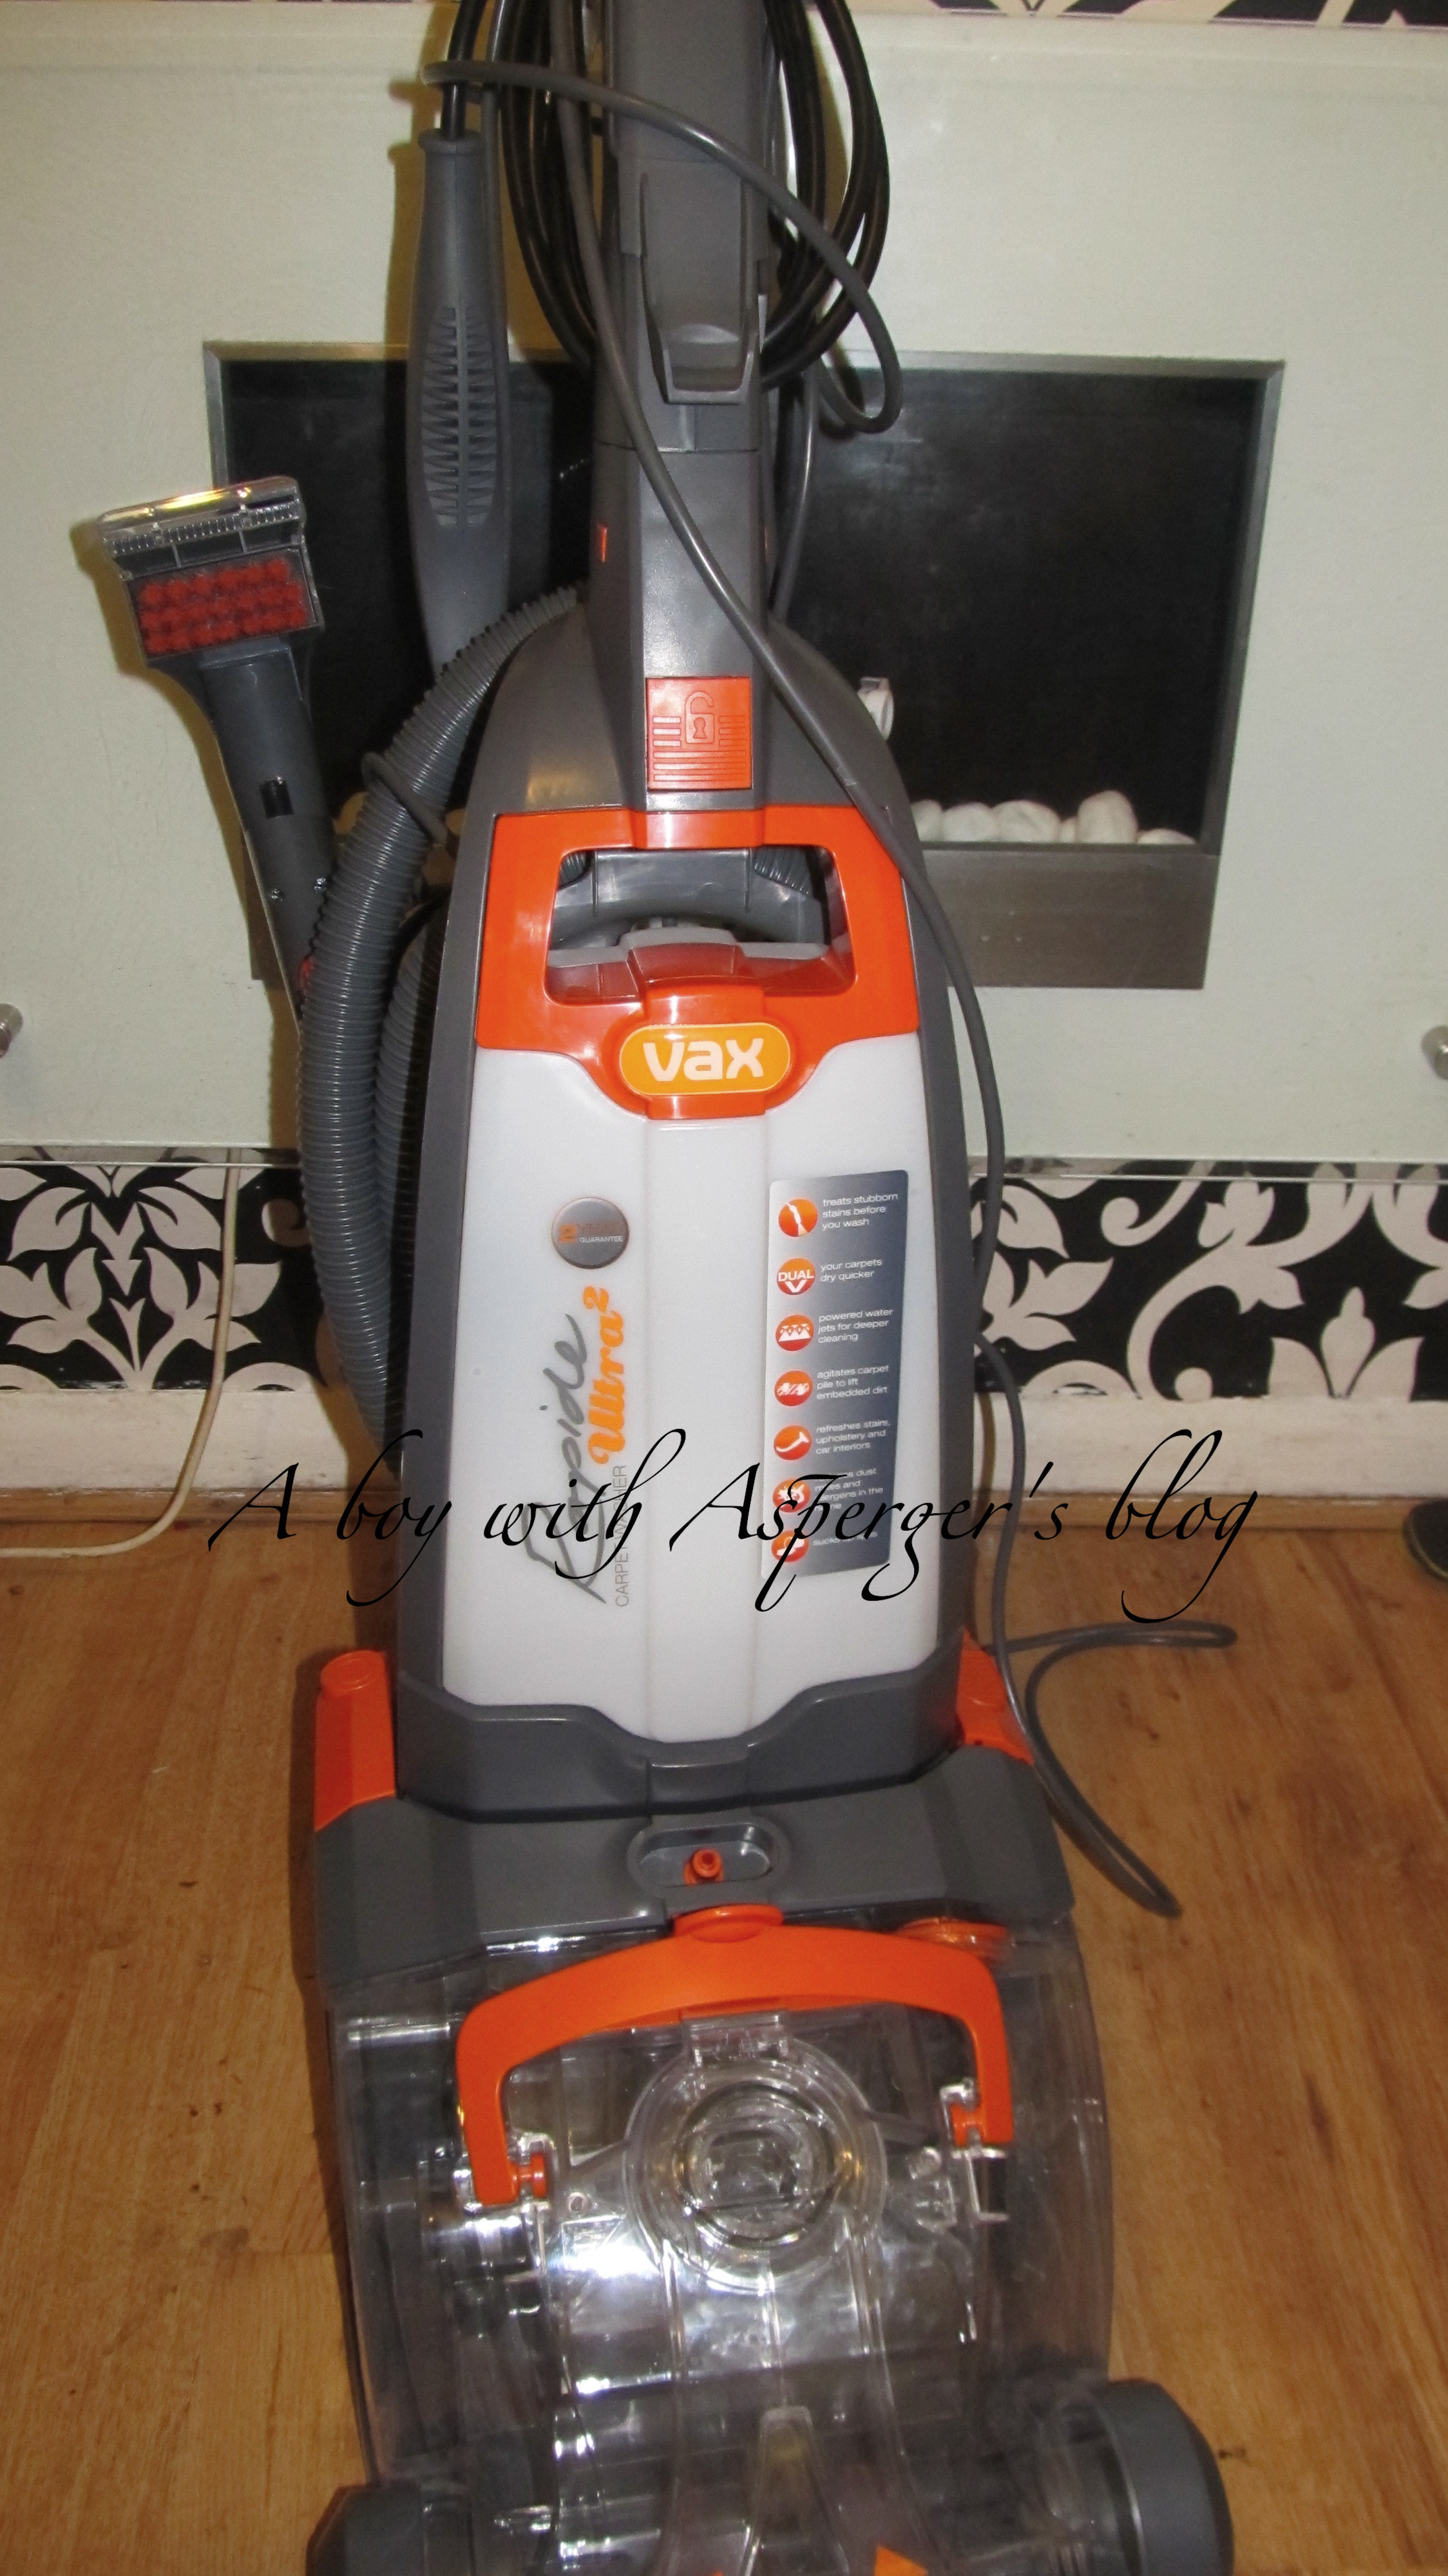 review of the vax w90 ru p rapide ultra 2 a boy with asperger s rh aspergersinfo wordpress com VAX Carpet Shampoo VAX Carpet Washer